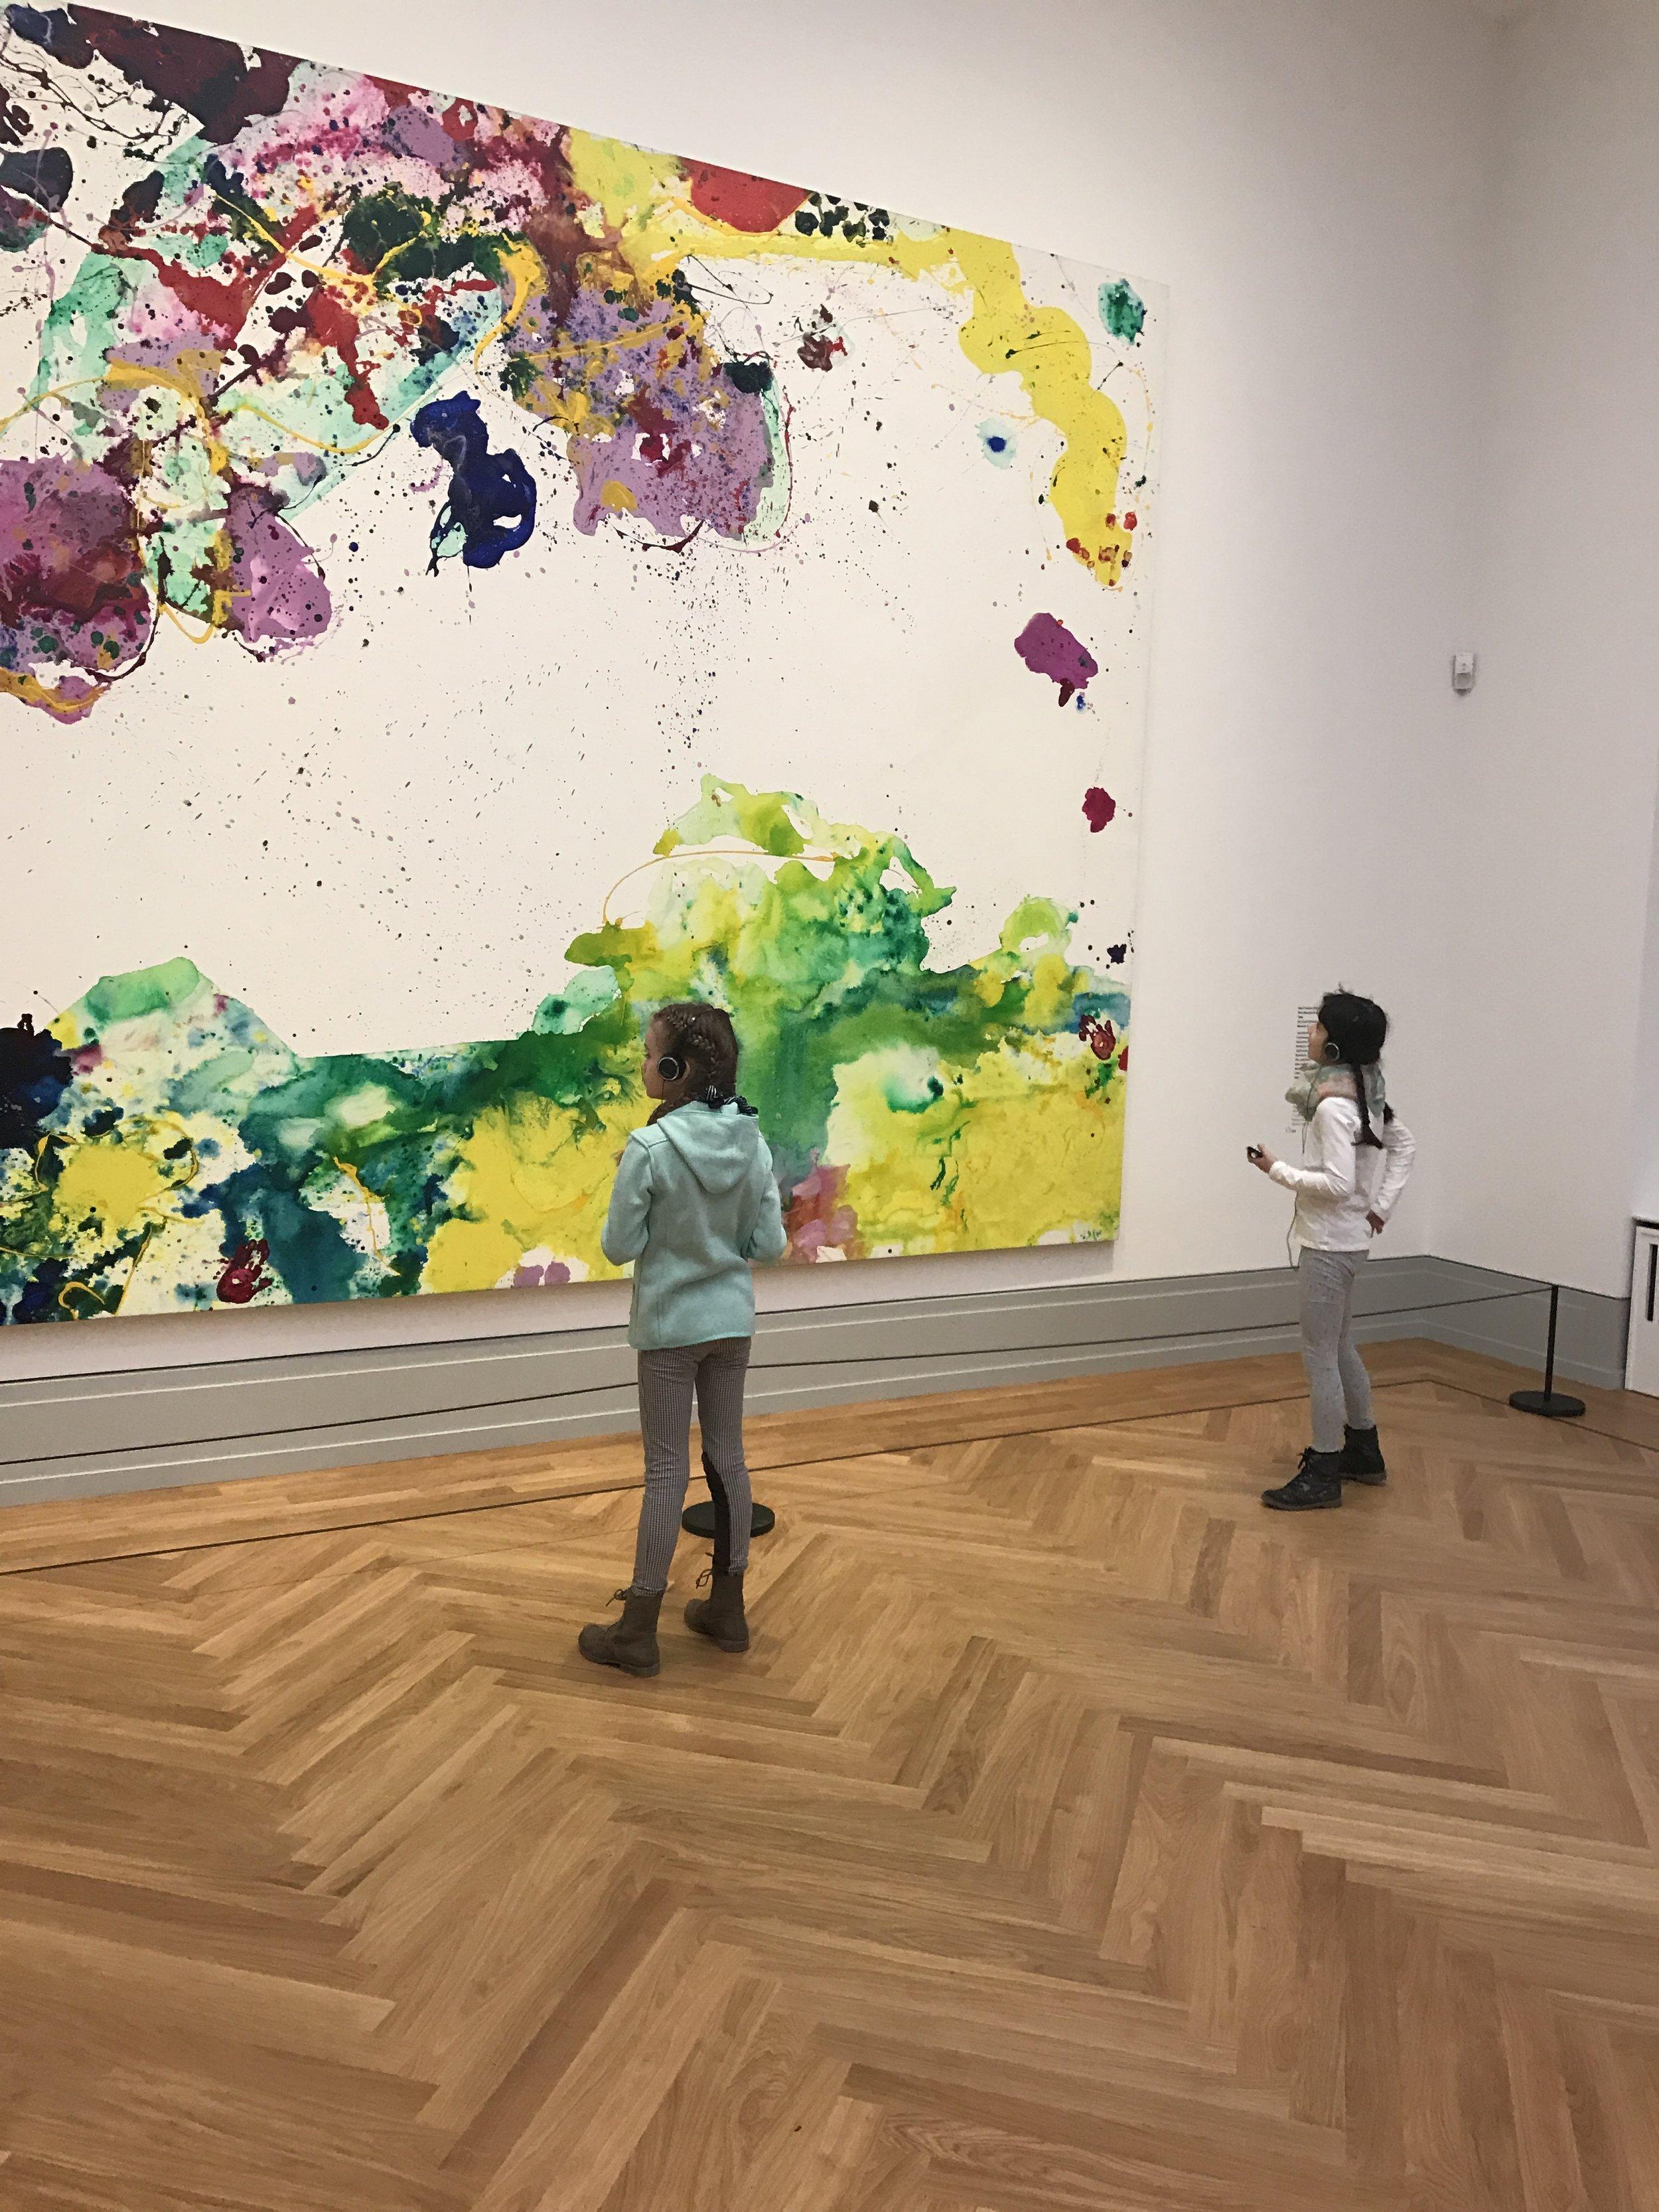 Kindertour Museum Barberini